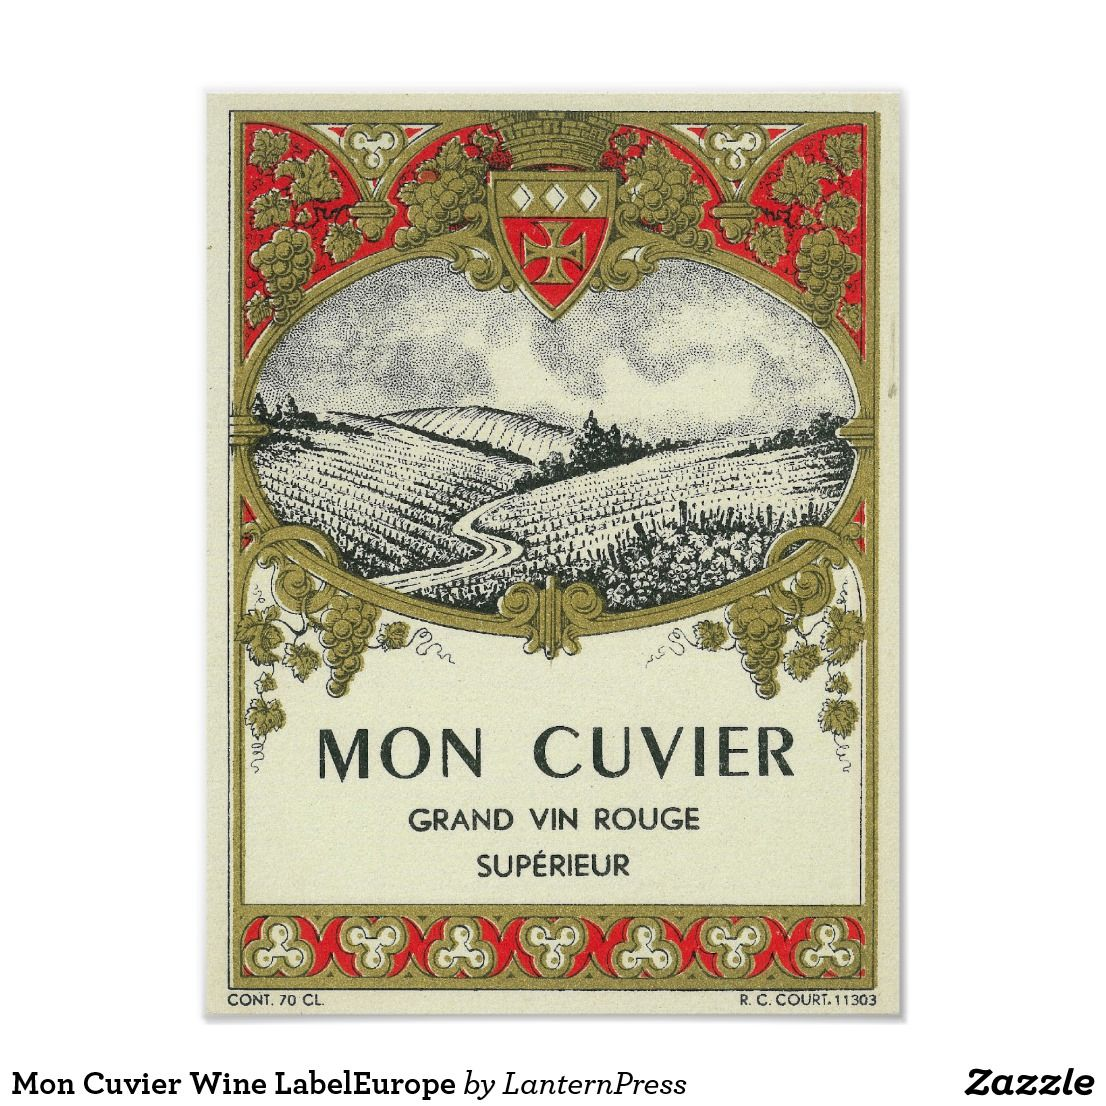 Mon Cuvier Wine Labeleurope Poster Zazzle Com In 2020 Vintage Wine Label Wine Wall Art Decor Wine Wall Art